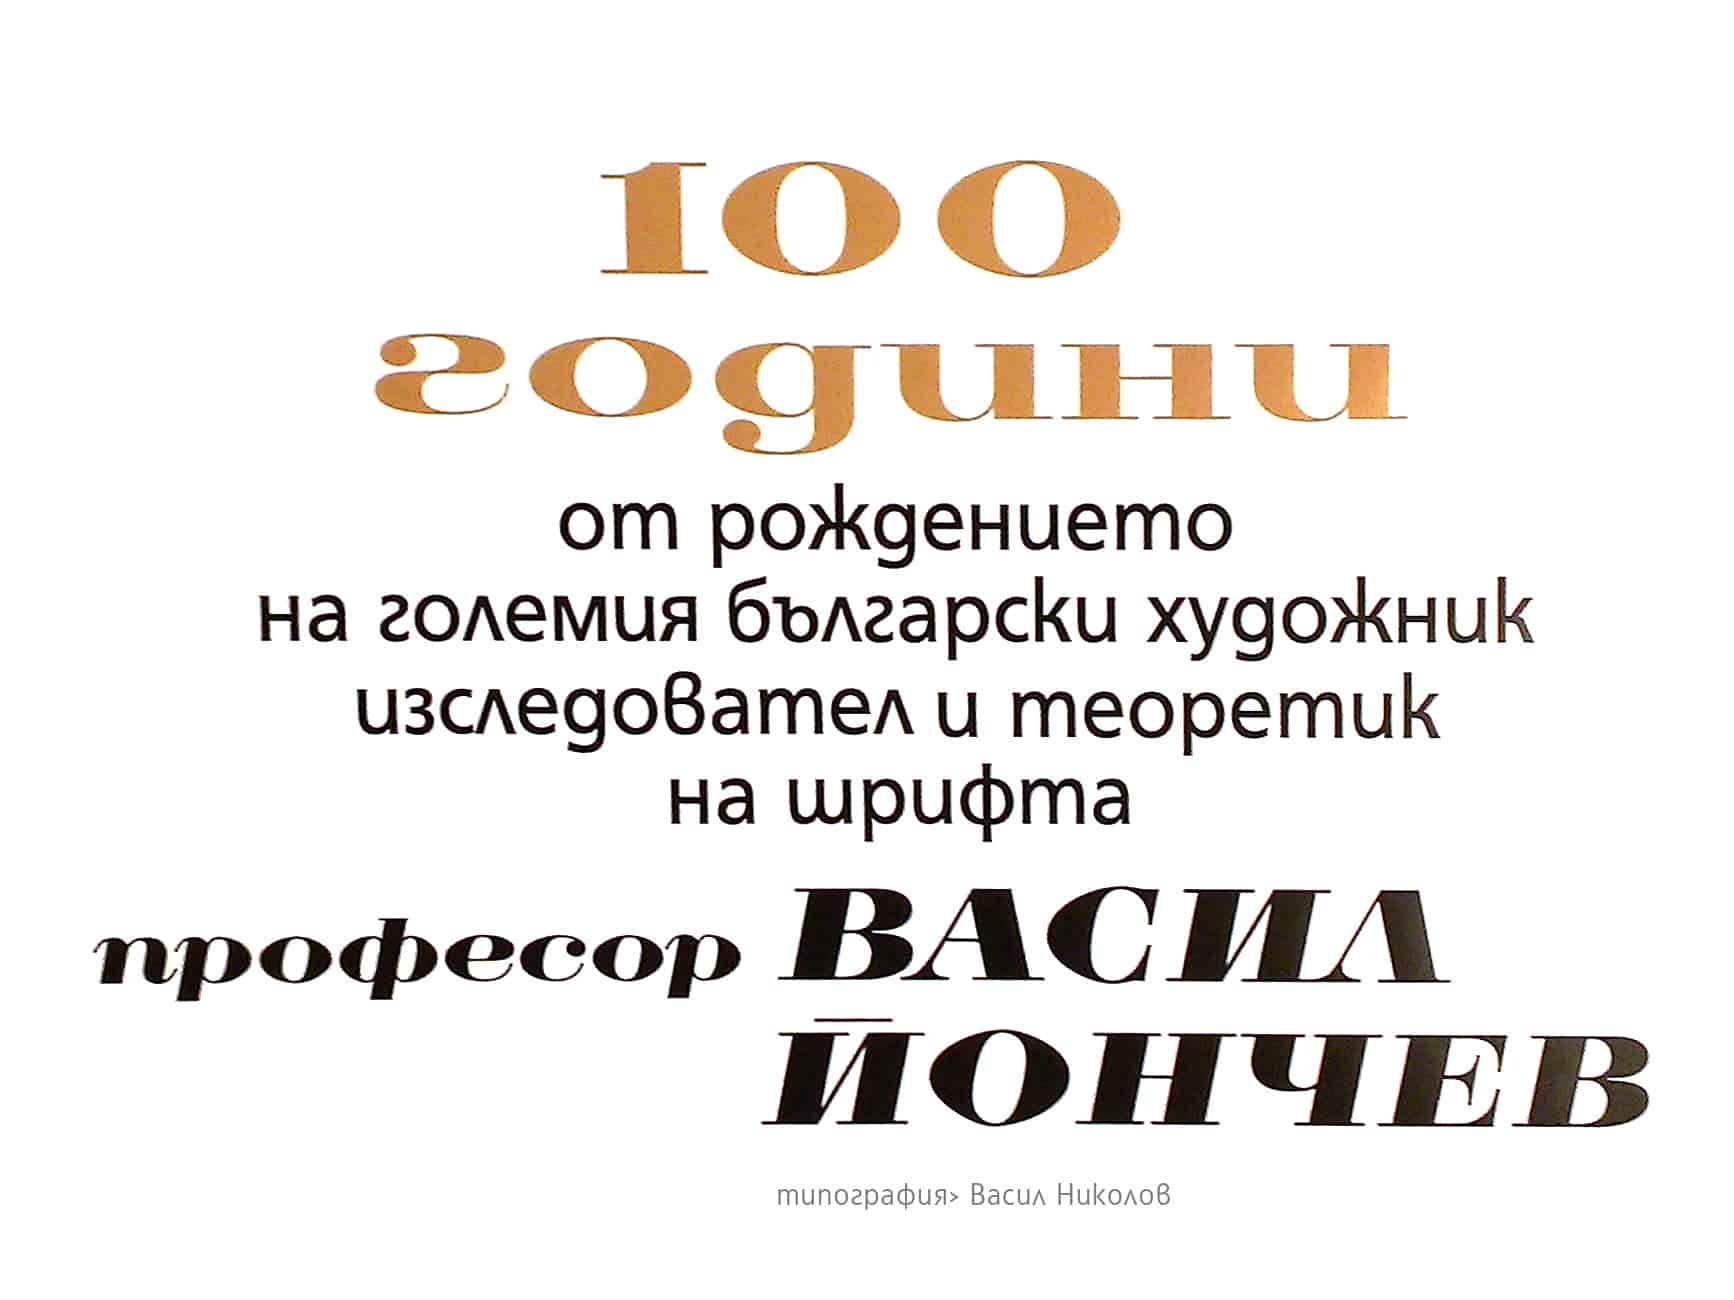 vasil_nikolov